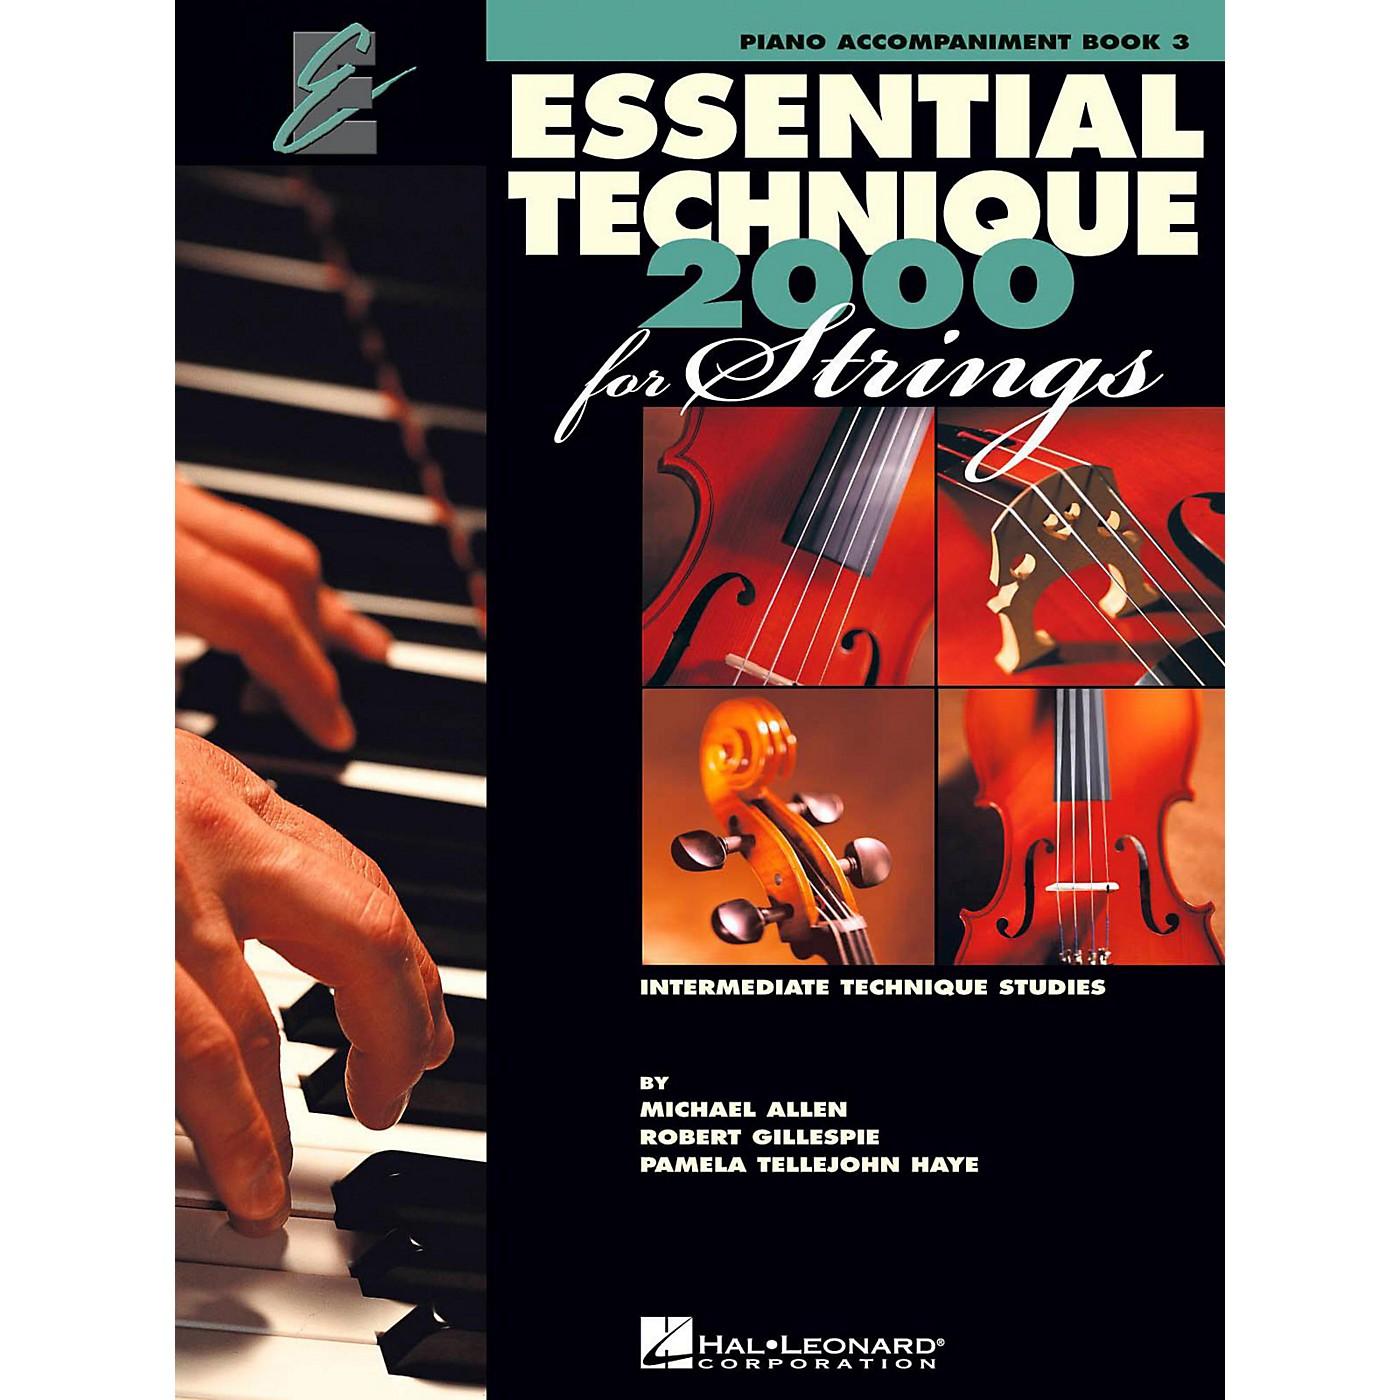 Hal Leonard Essential Technique for Strings - Piano Accompaniment (Book 3) thumbnail